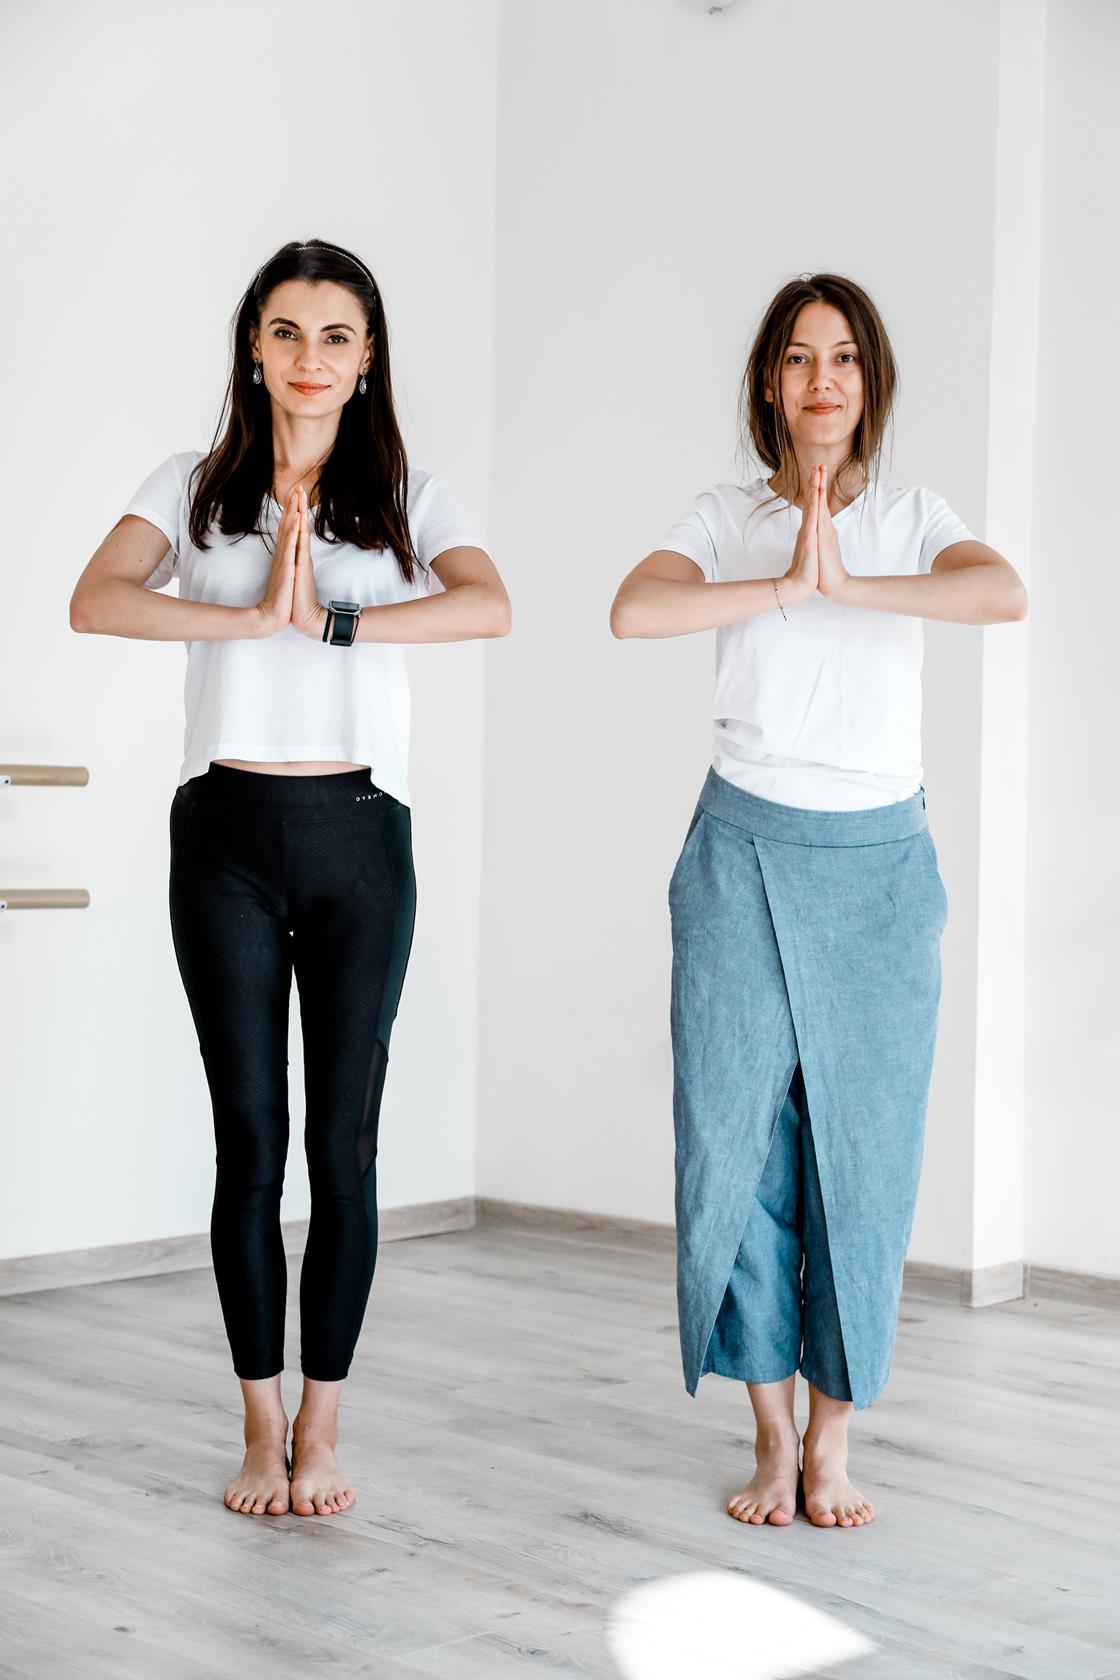 Laura Calin_Mia Munteanu_Yoga Day by Yoga City_Yoga Bucuresti.jpg